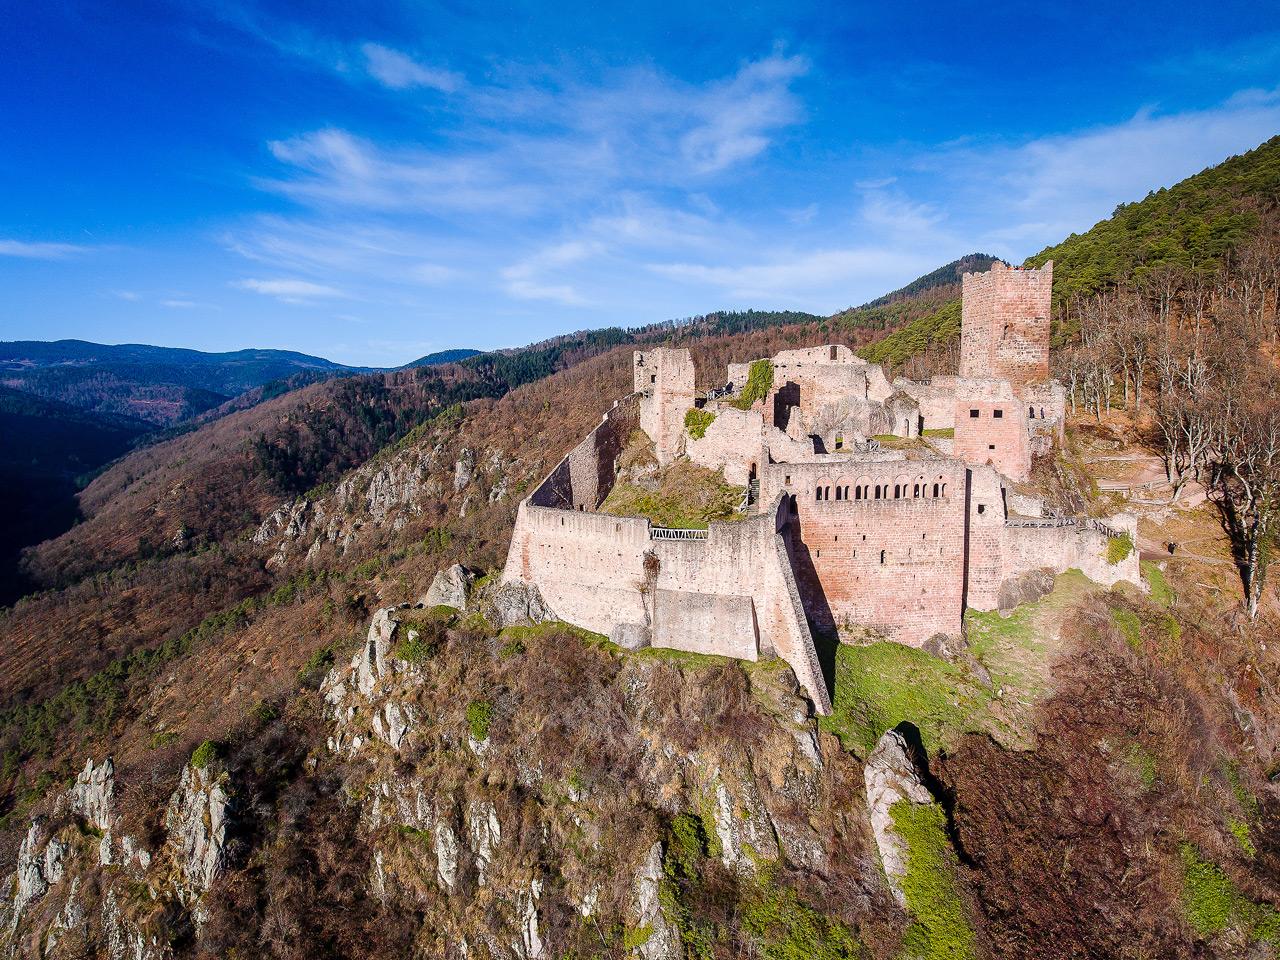 Chateau de Ribeauvillé DJI_0149